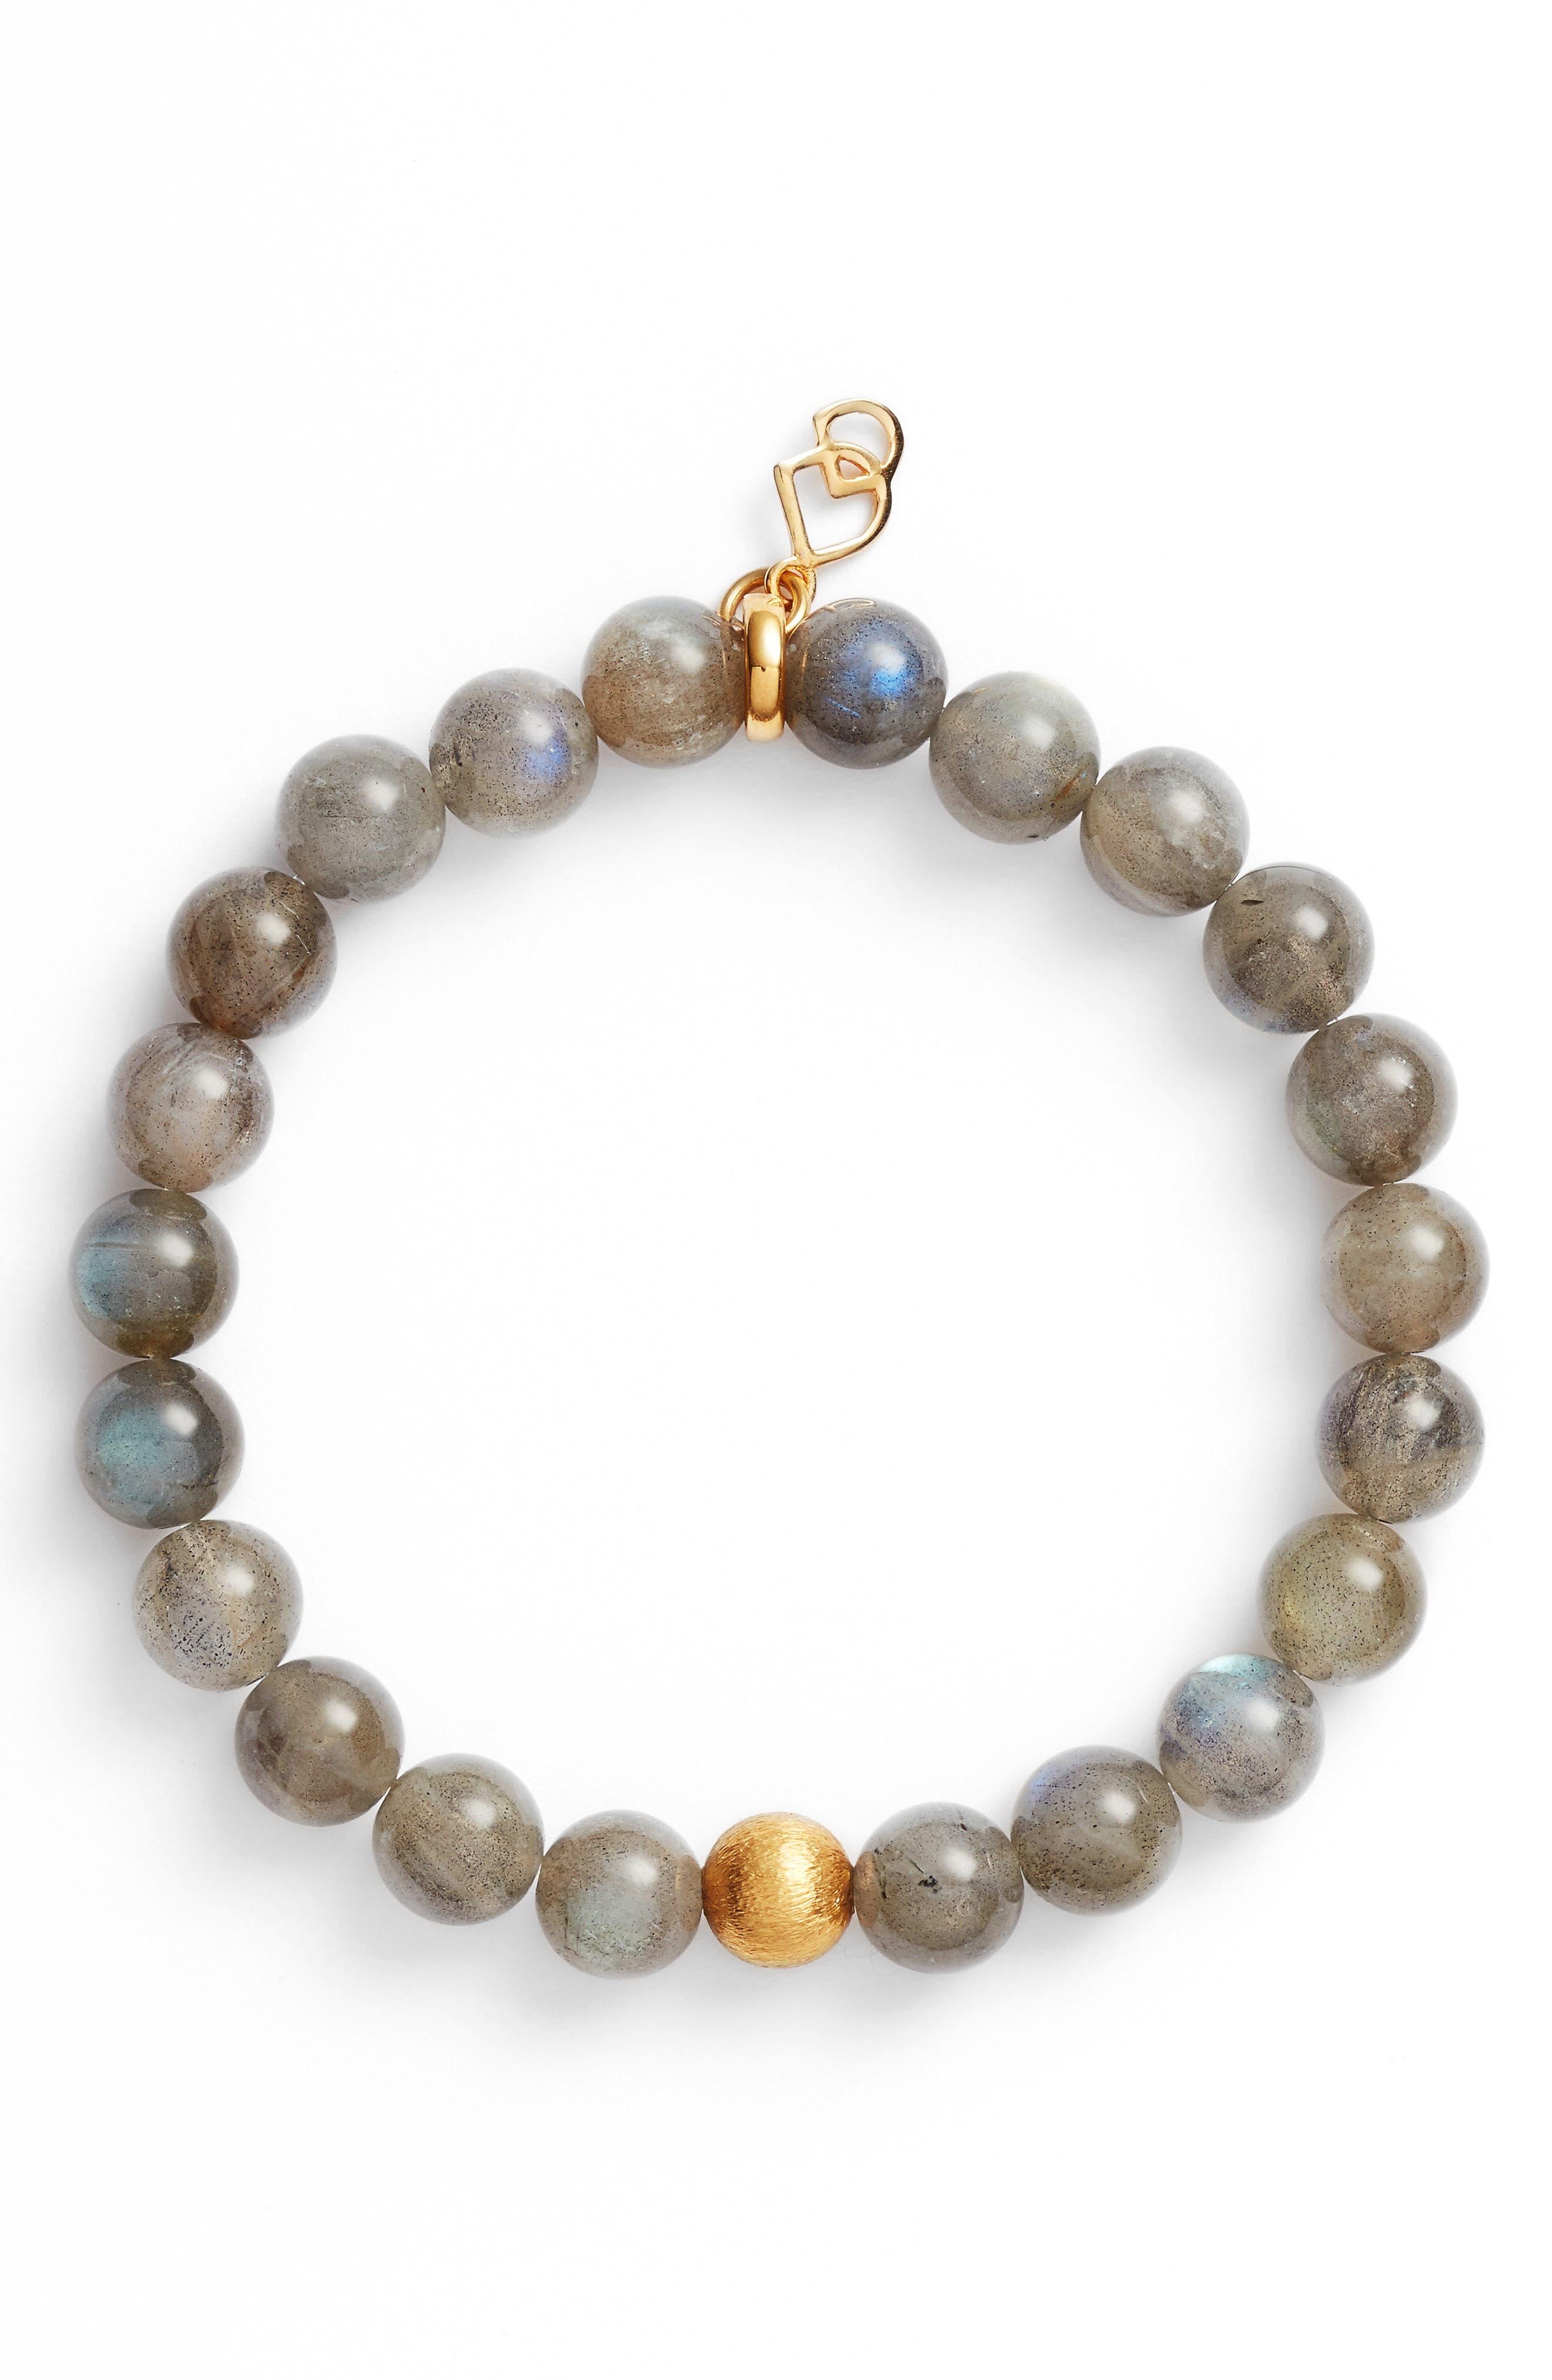 Sphere Semiprecious Stone Elastic Bracelet,                             Main thumbnail 1, color,                             LABRADORITE/ GOLD